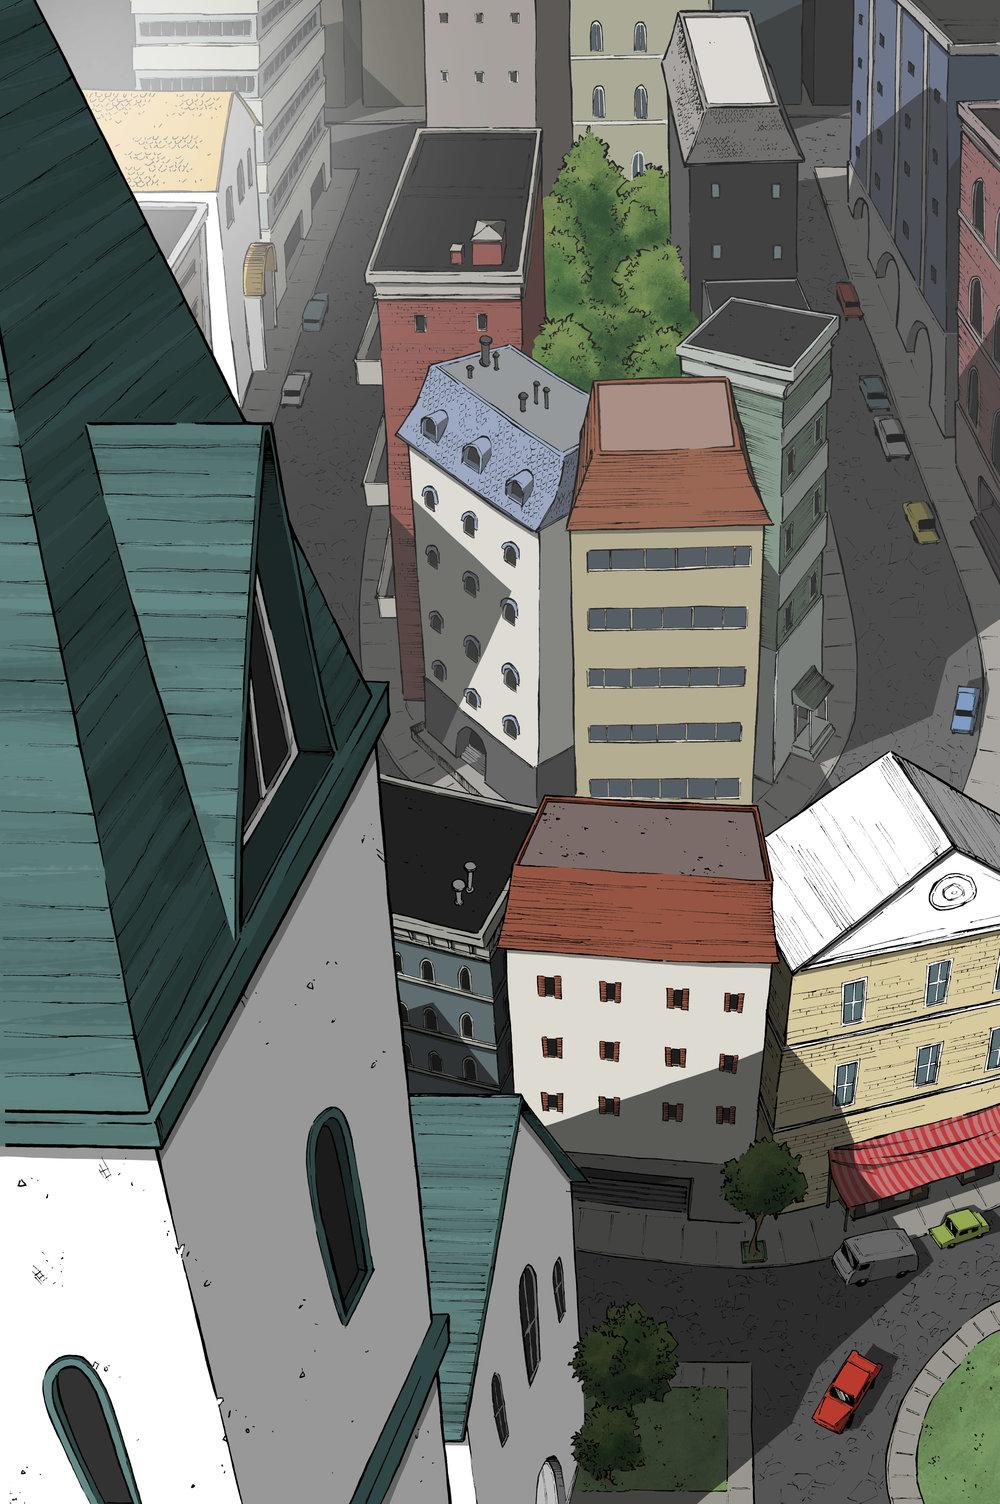 Smallstreet02_color02.jpg